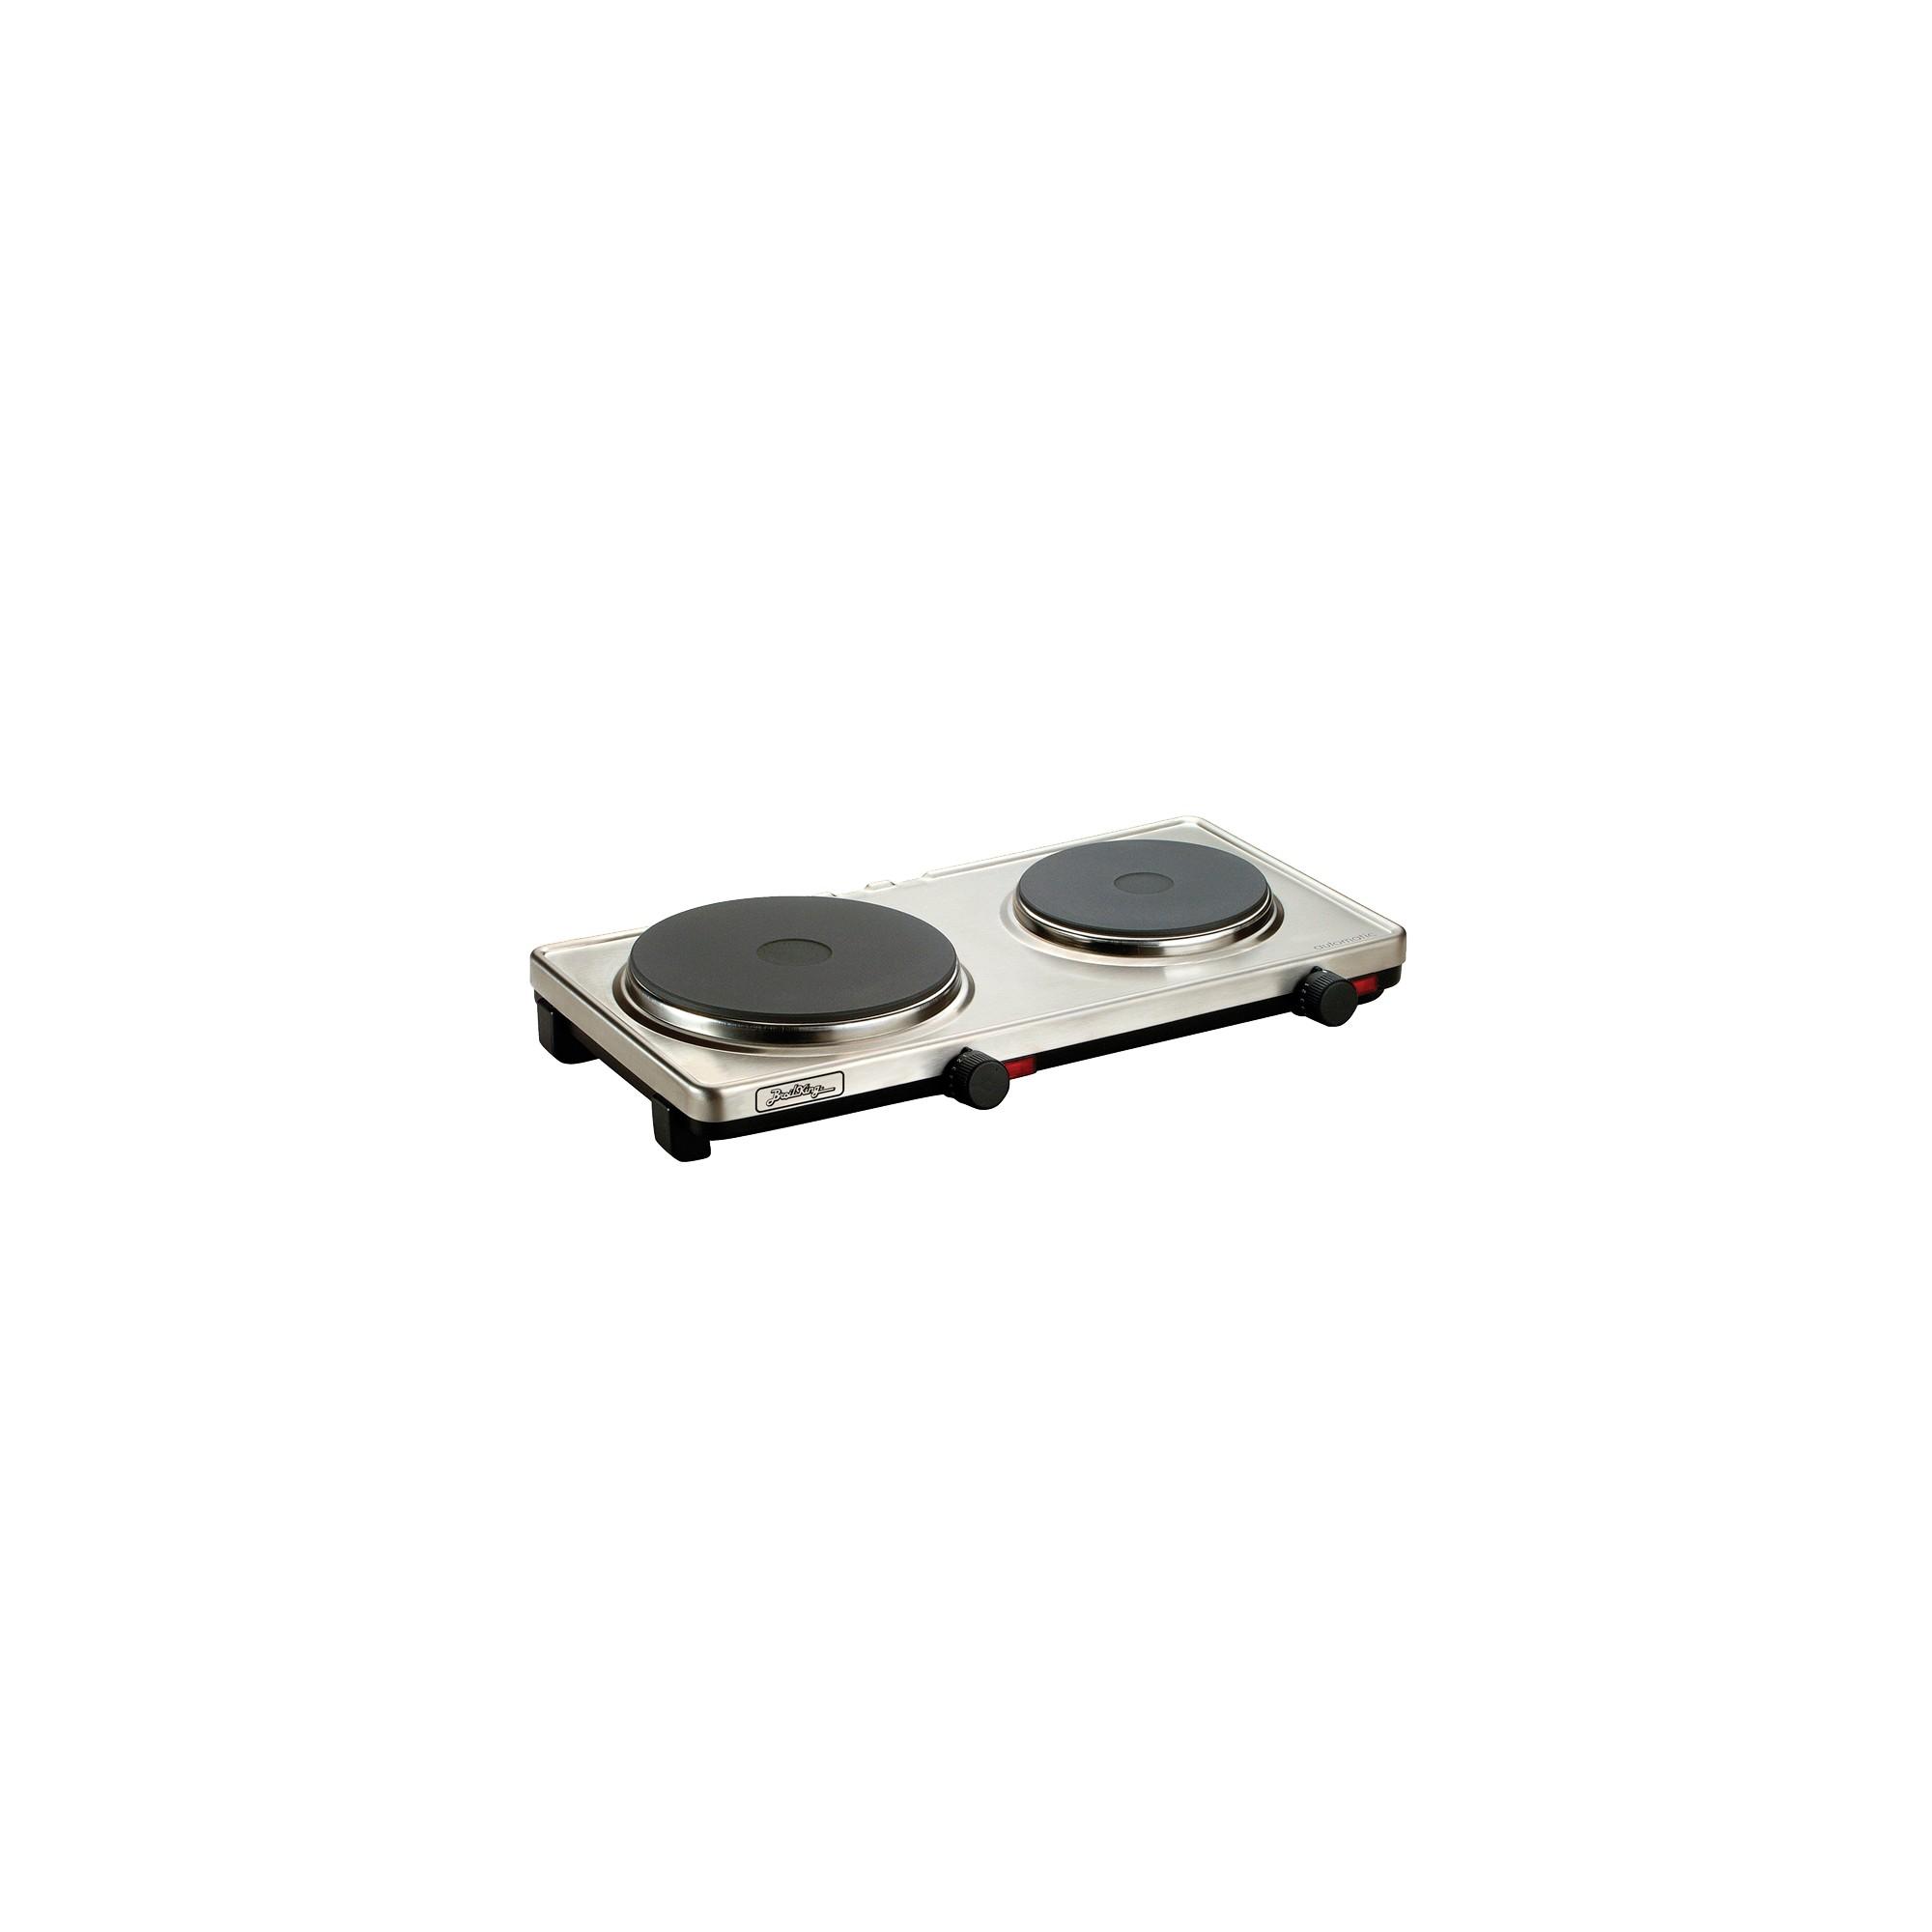 BroilKing Double Cast Iron Burner Range/Hot Plate - Silvertone